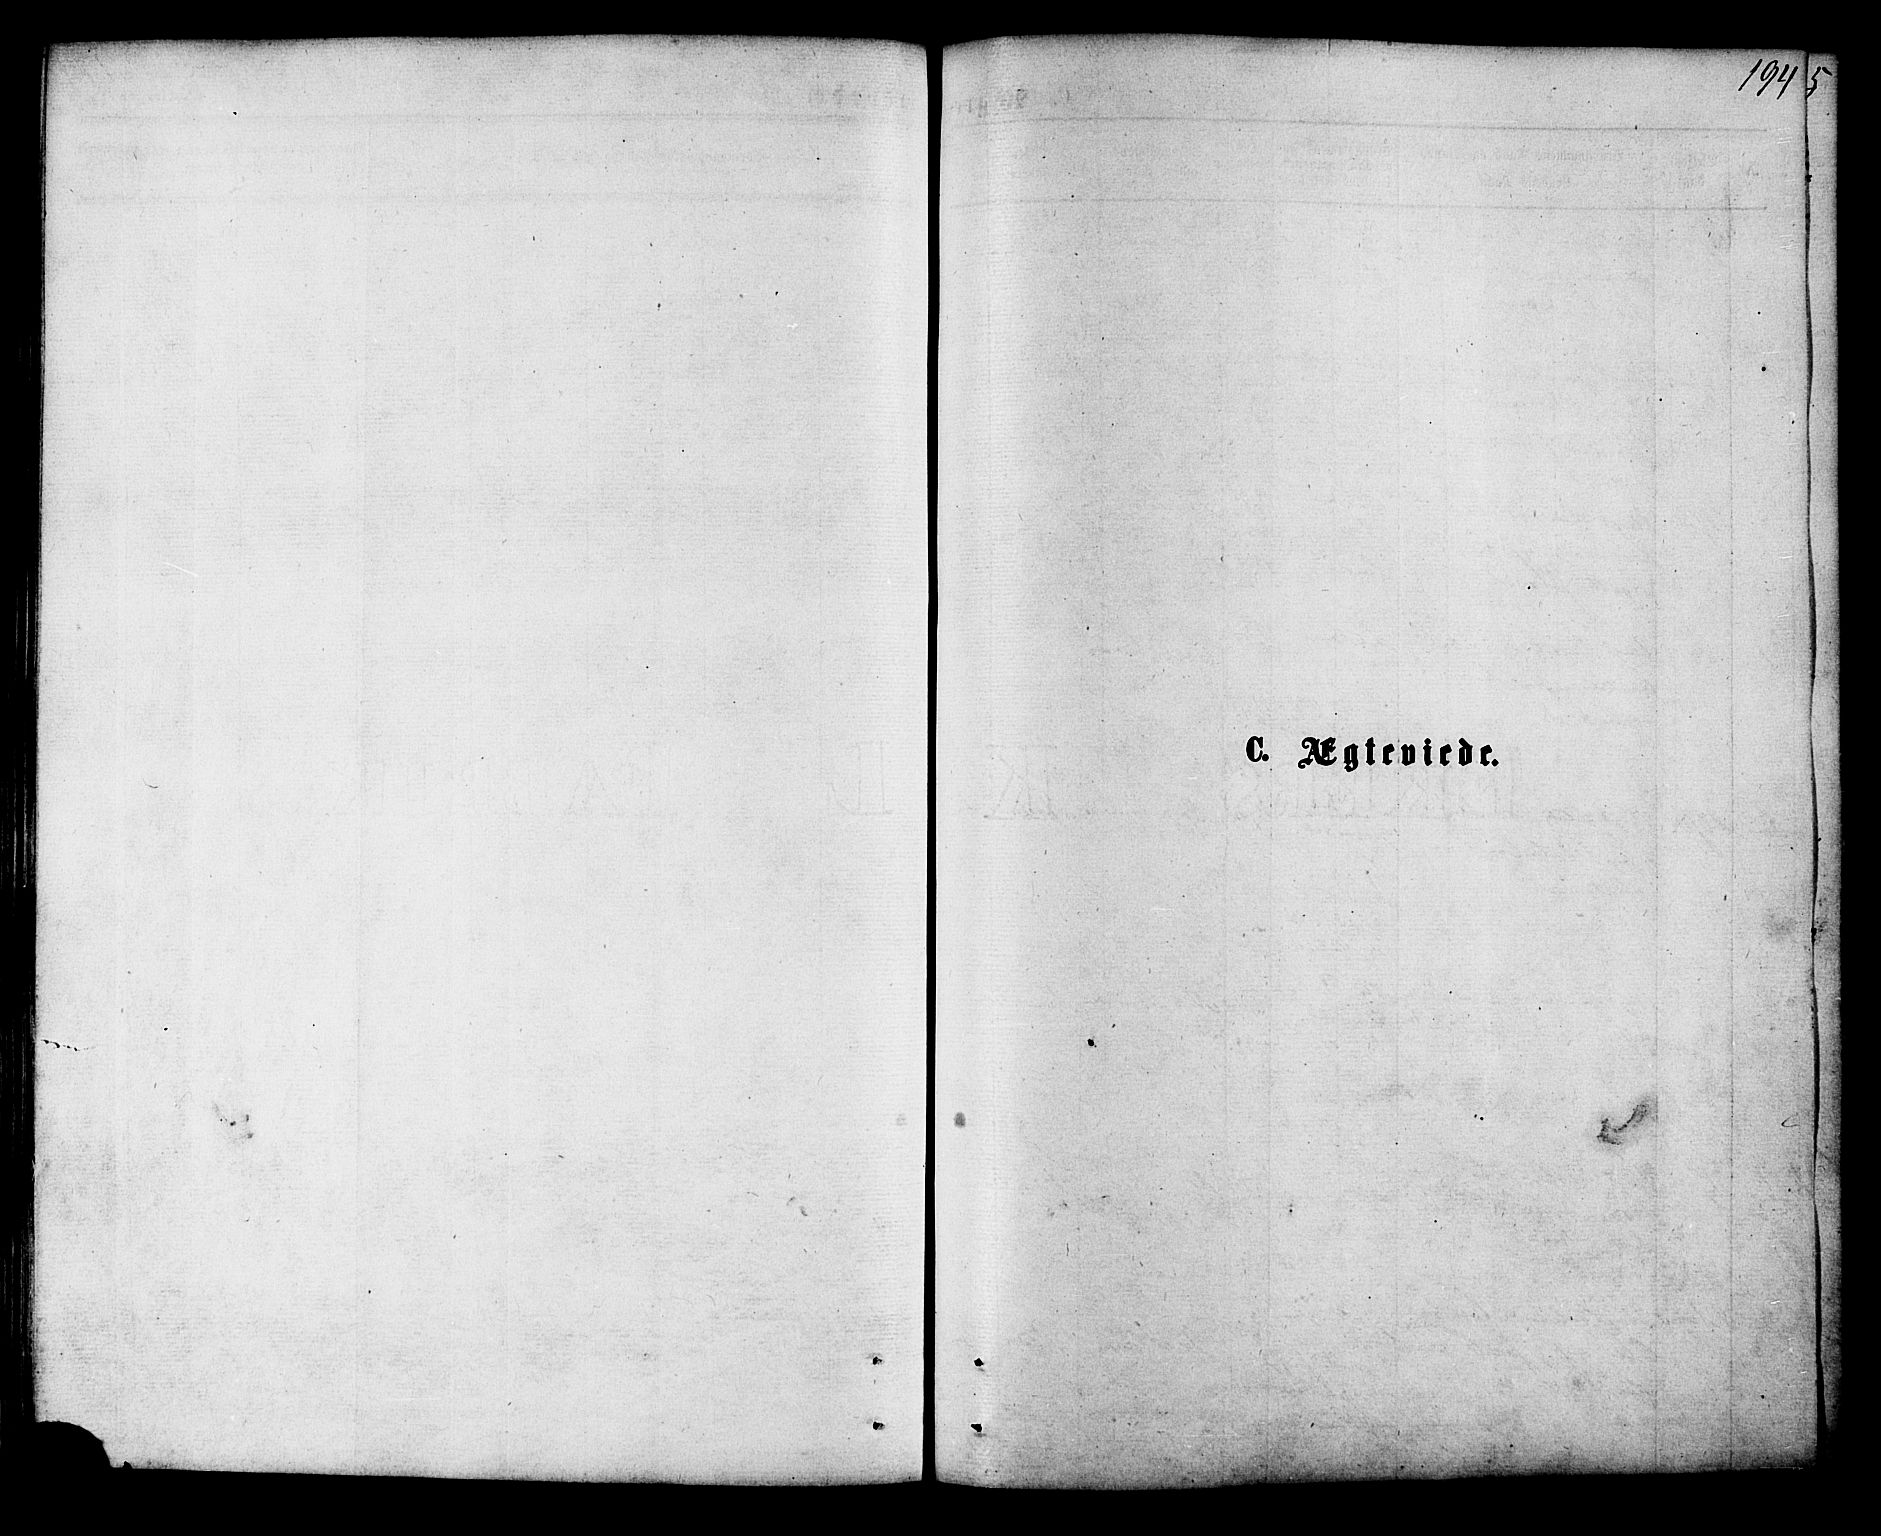 SAT, Ministerialprotokoller, klokkerbøker og fødselsregistre - Nordland, 853/L0771: Ministerialbok nr. 853A10, 1870-1881, s. 194